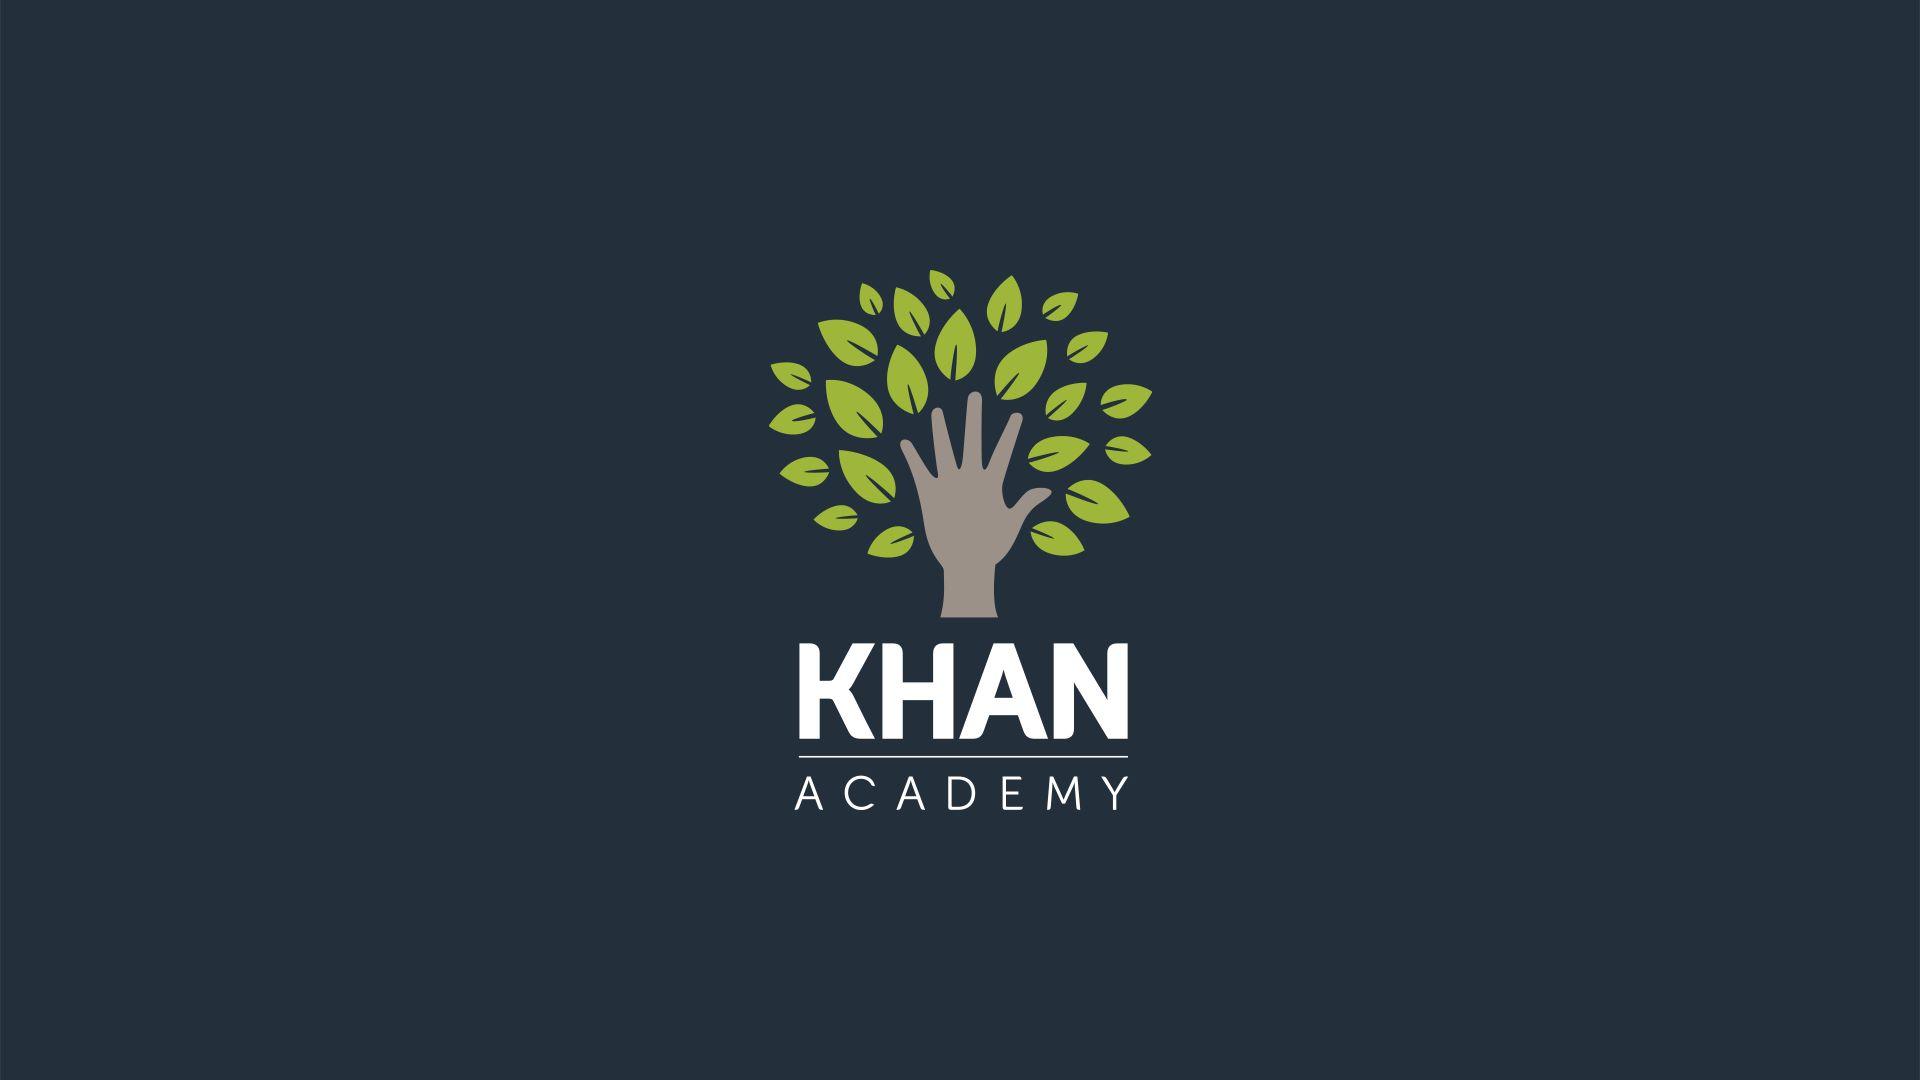 Khan Academy - Do with tech